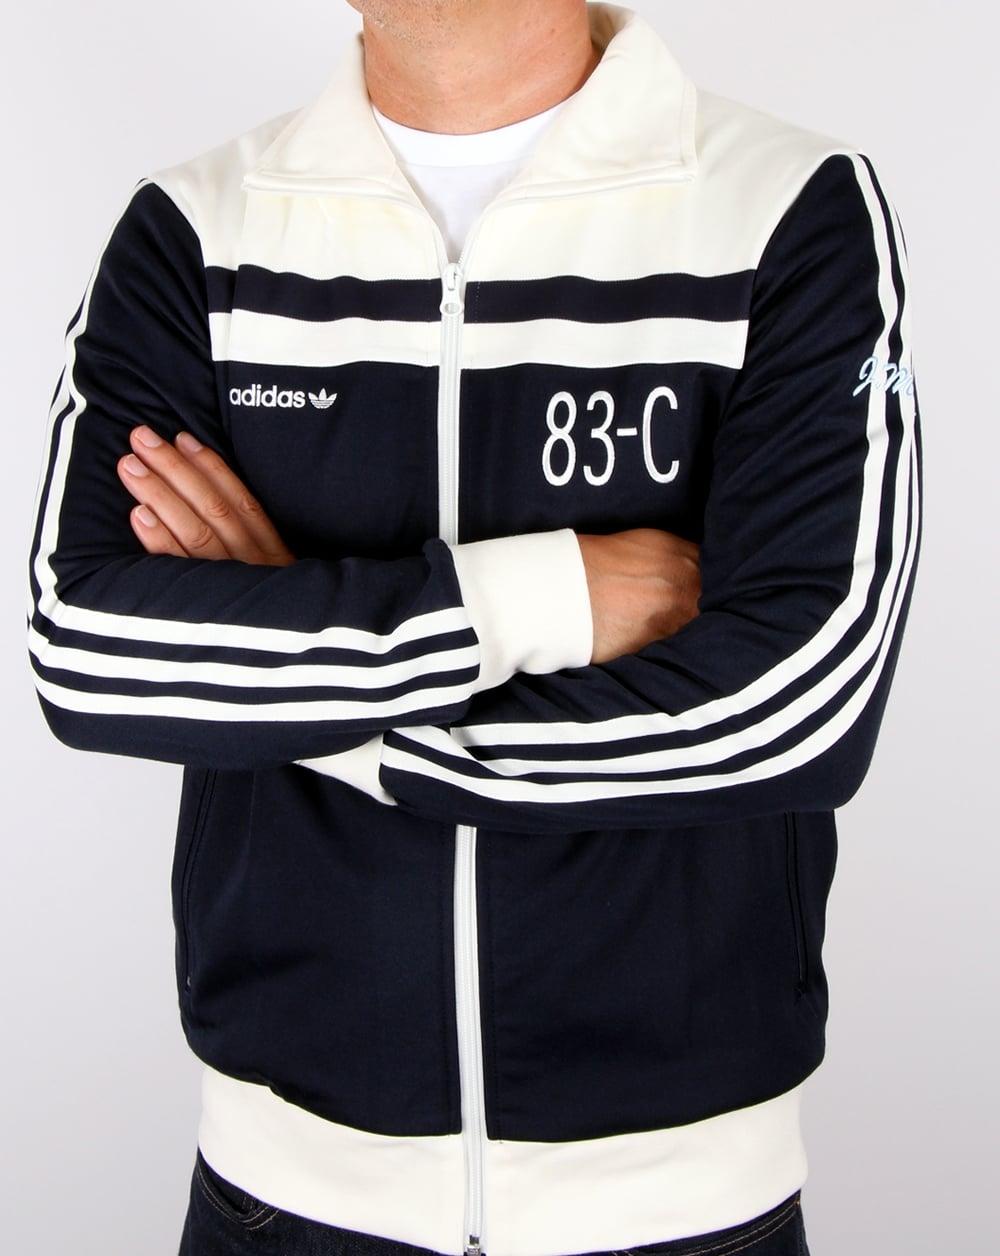 adidas jacke 83 c track top